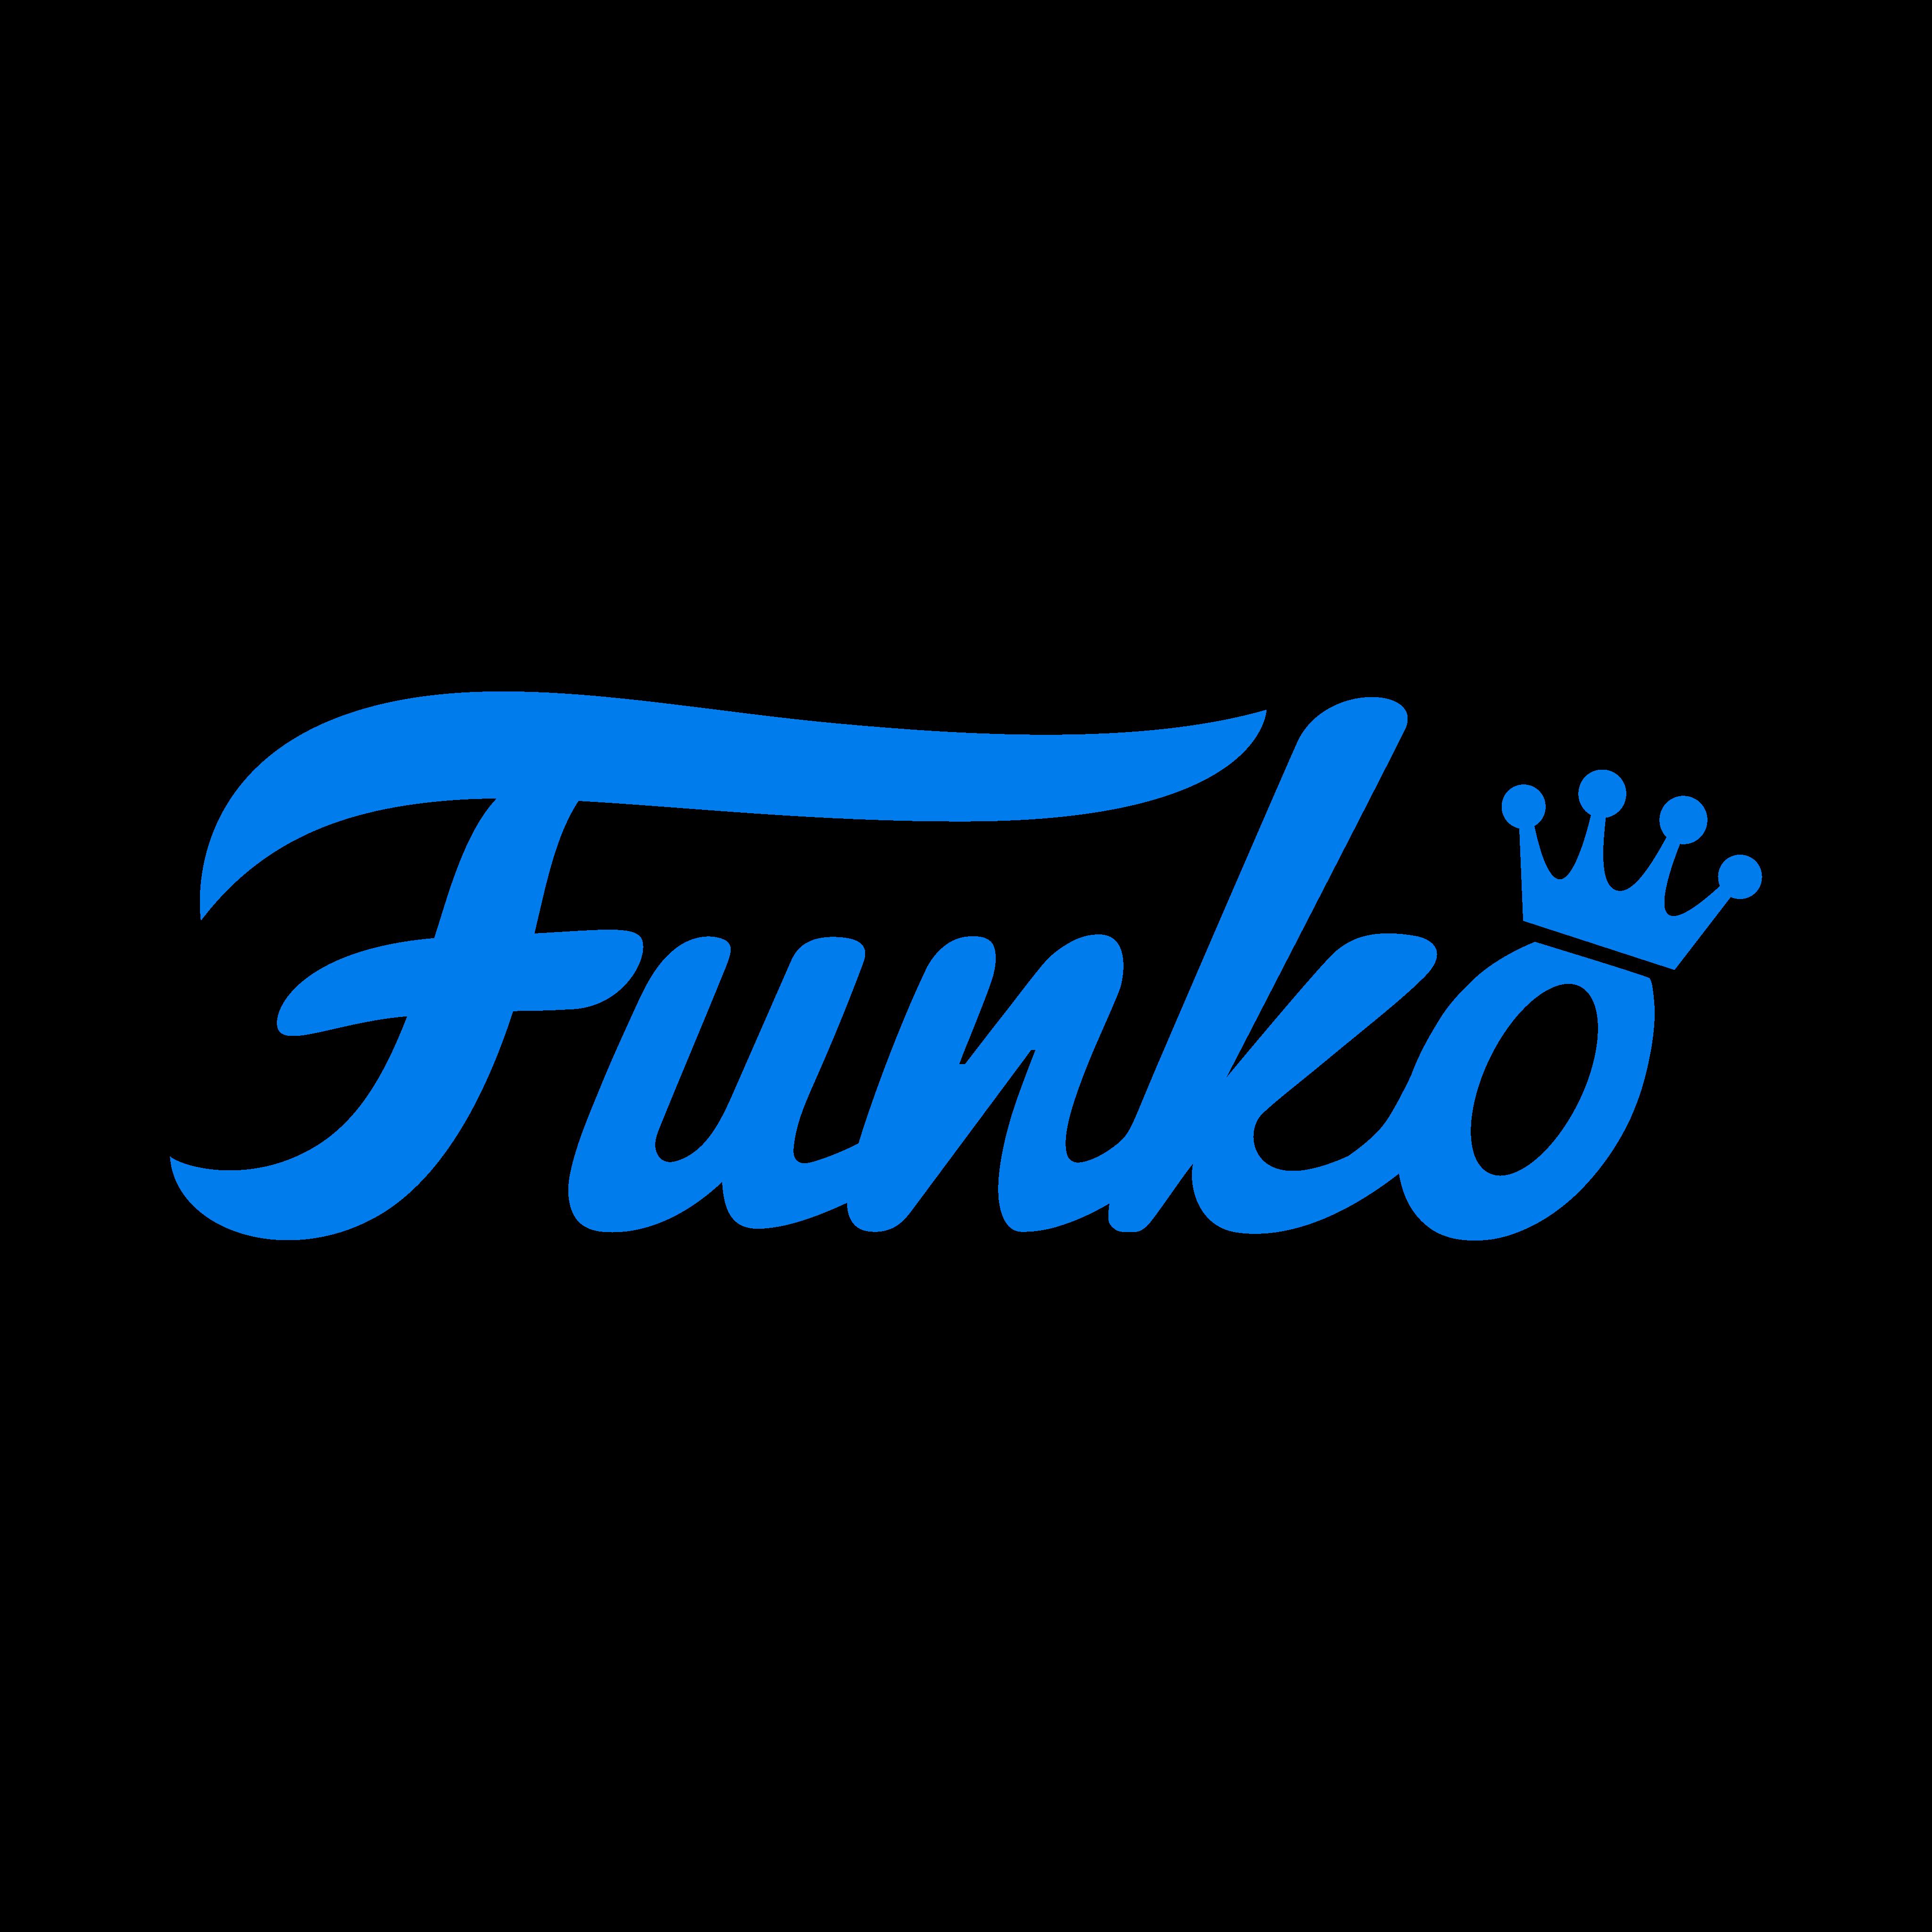 funko logo 0 - Funko Logo